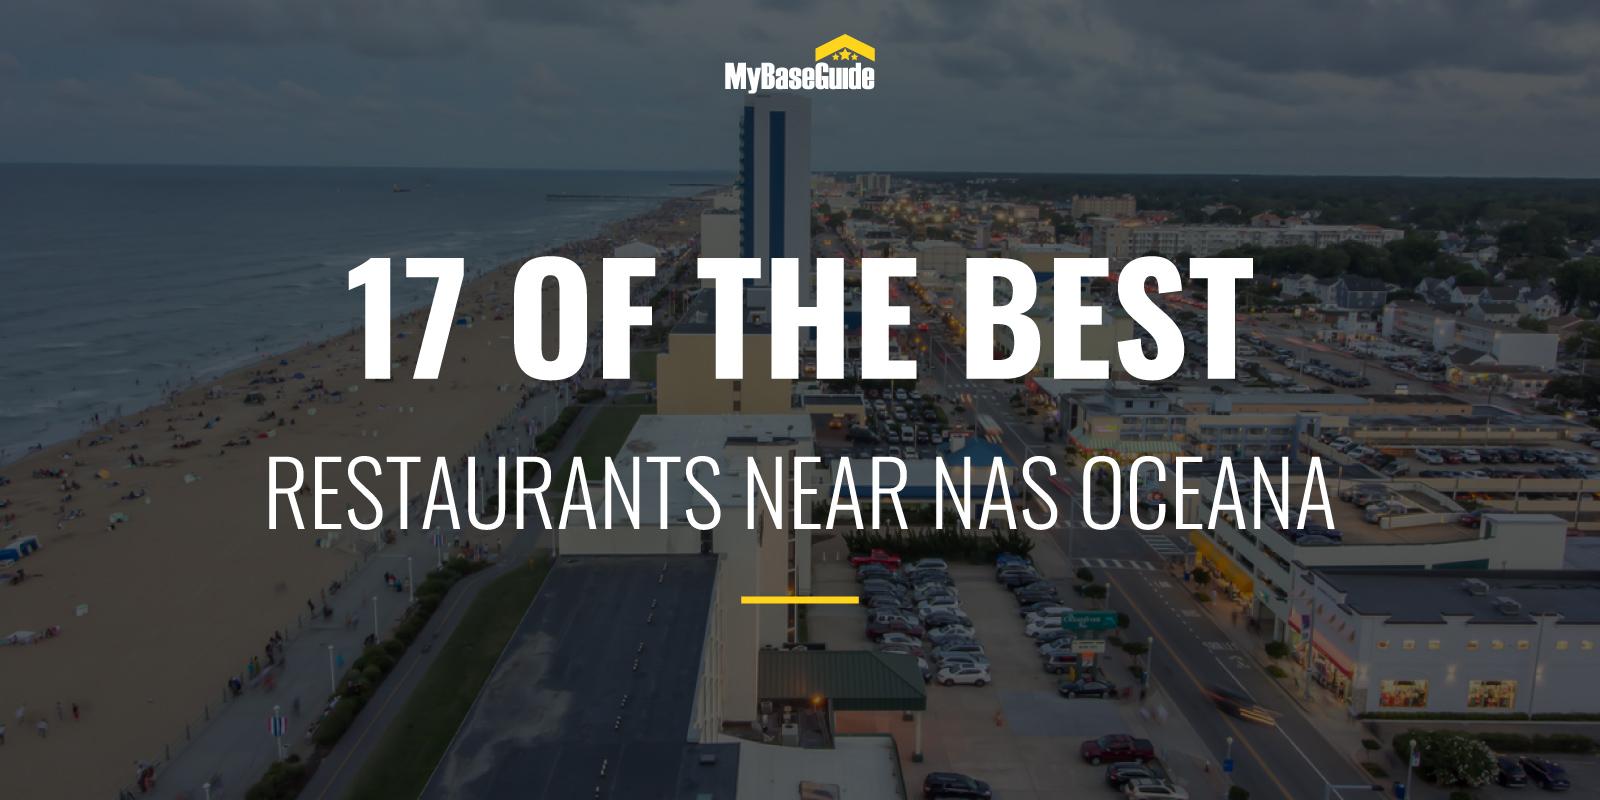 17 of the Best Restaurants Near NAS Oceana